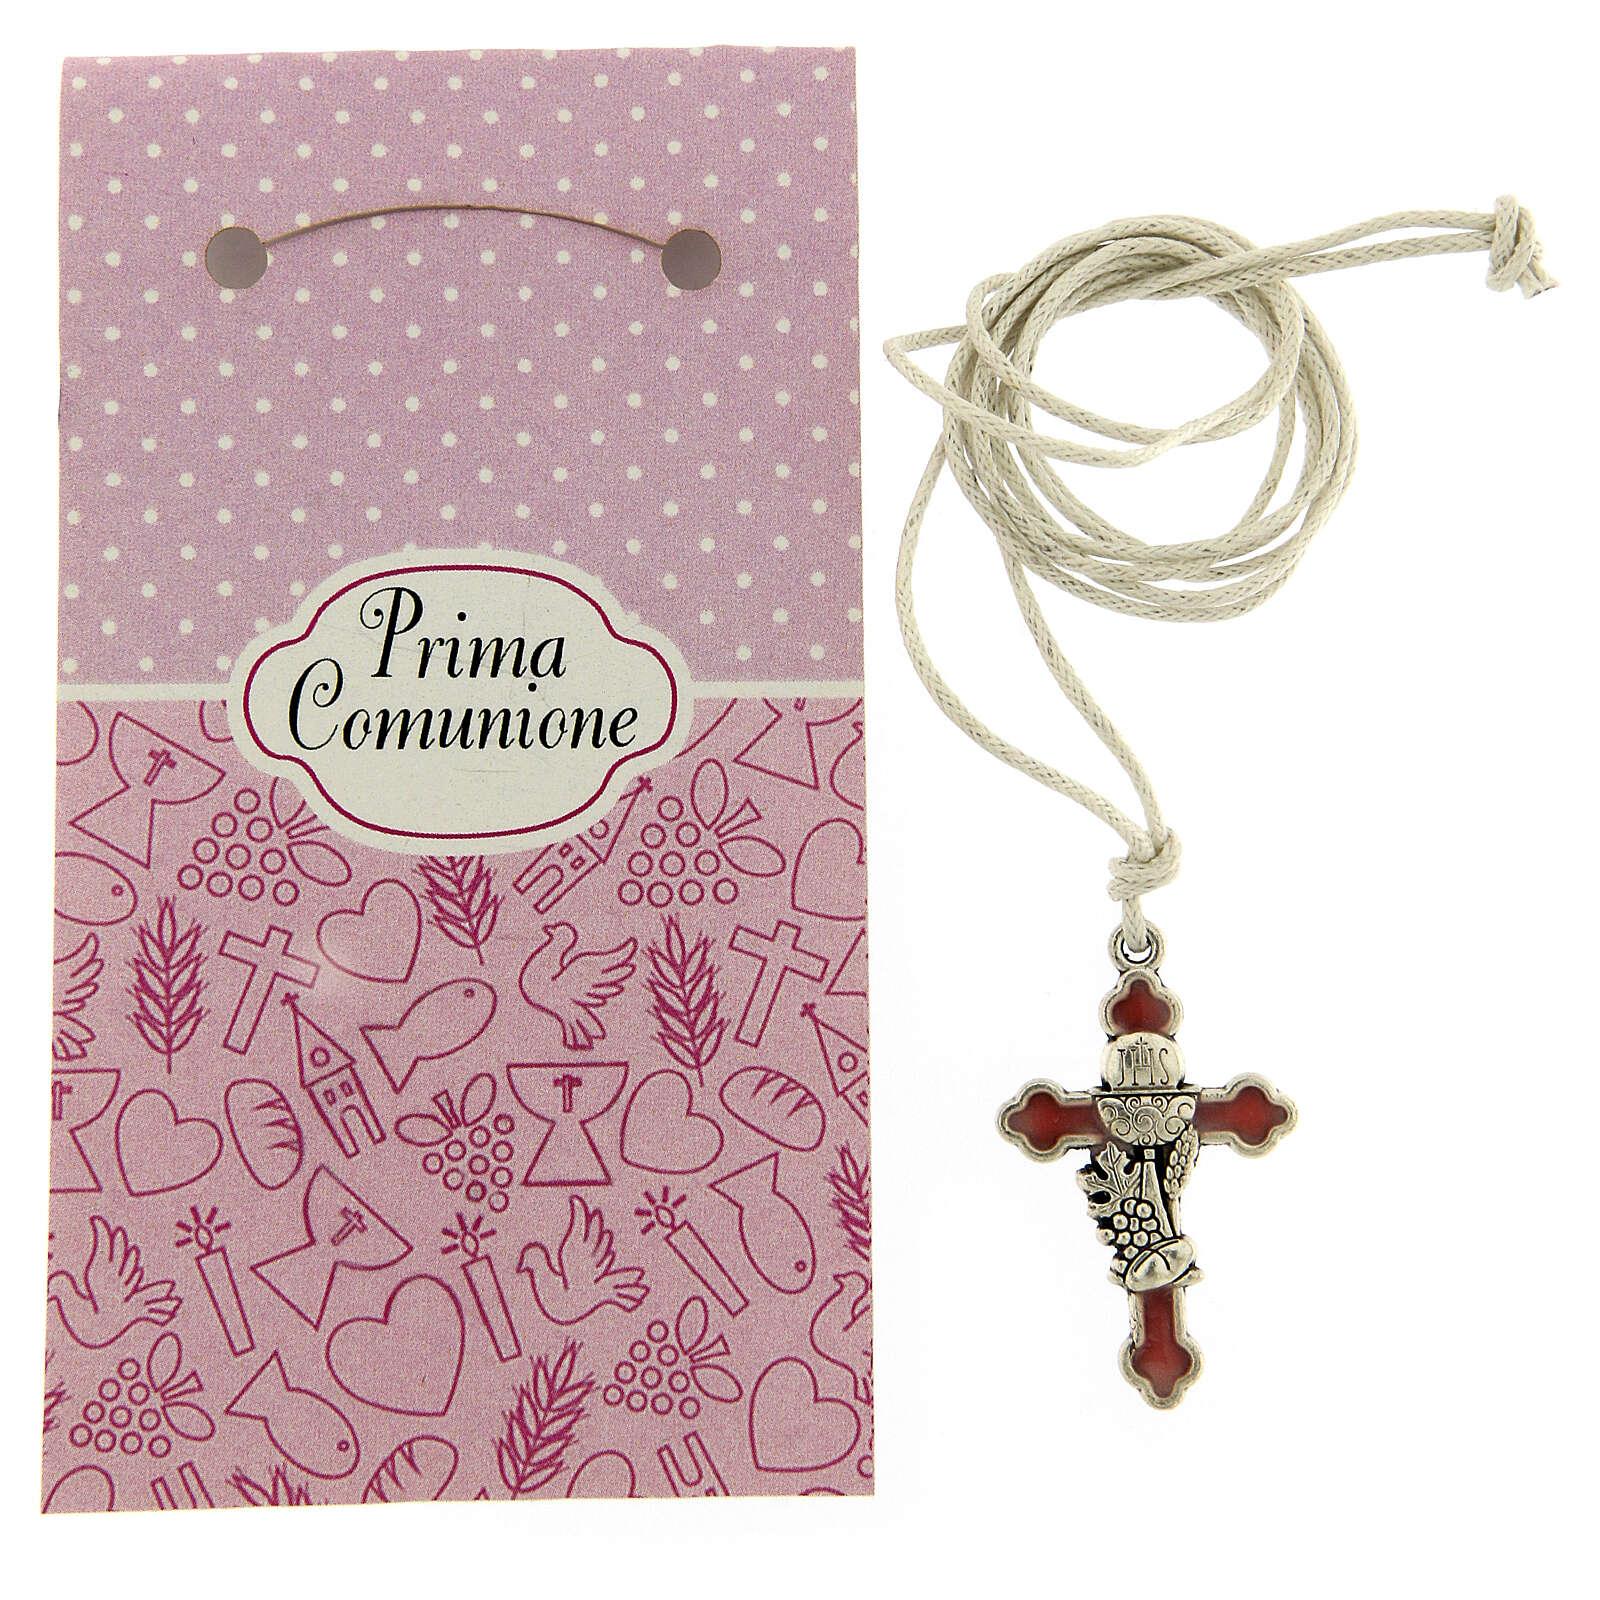 Communion pink nail polish pendant 3